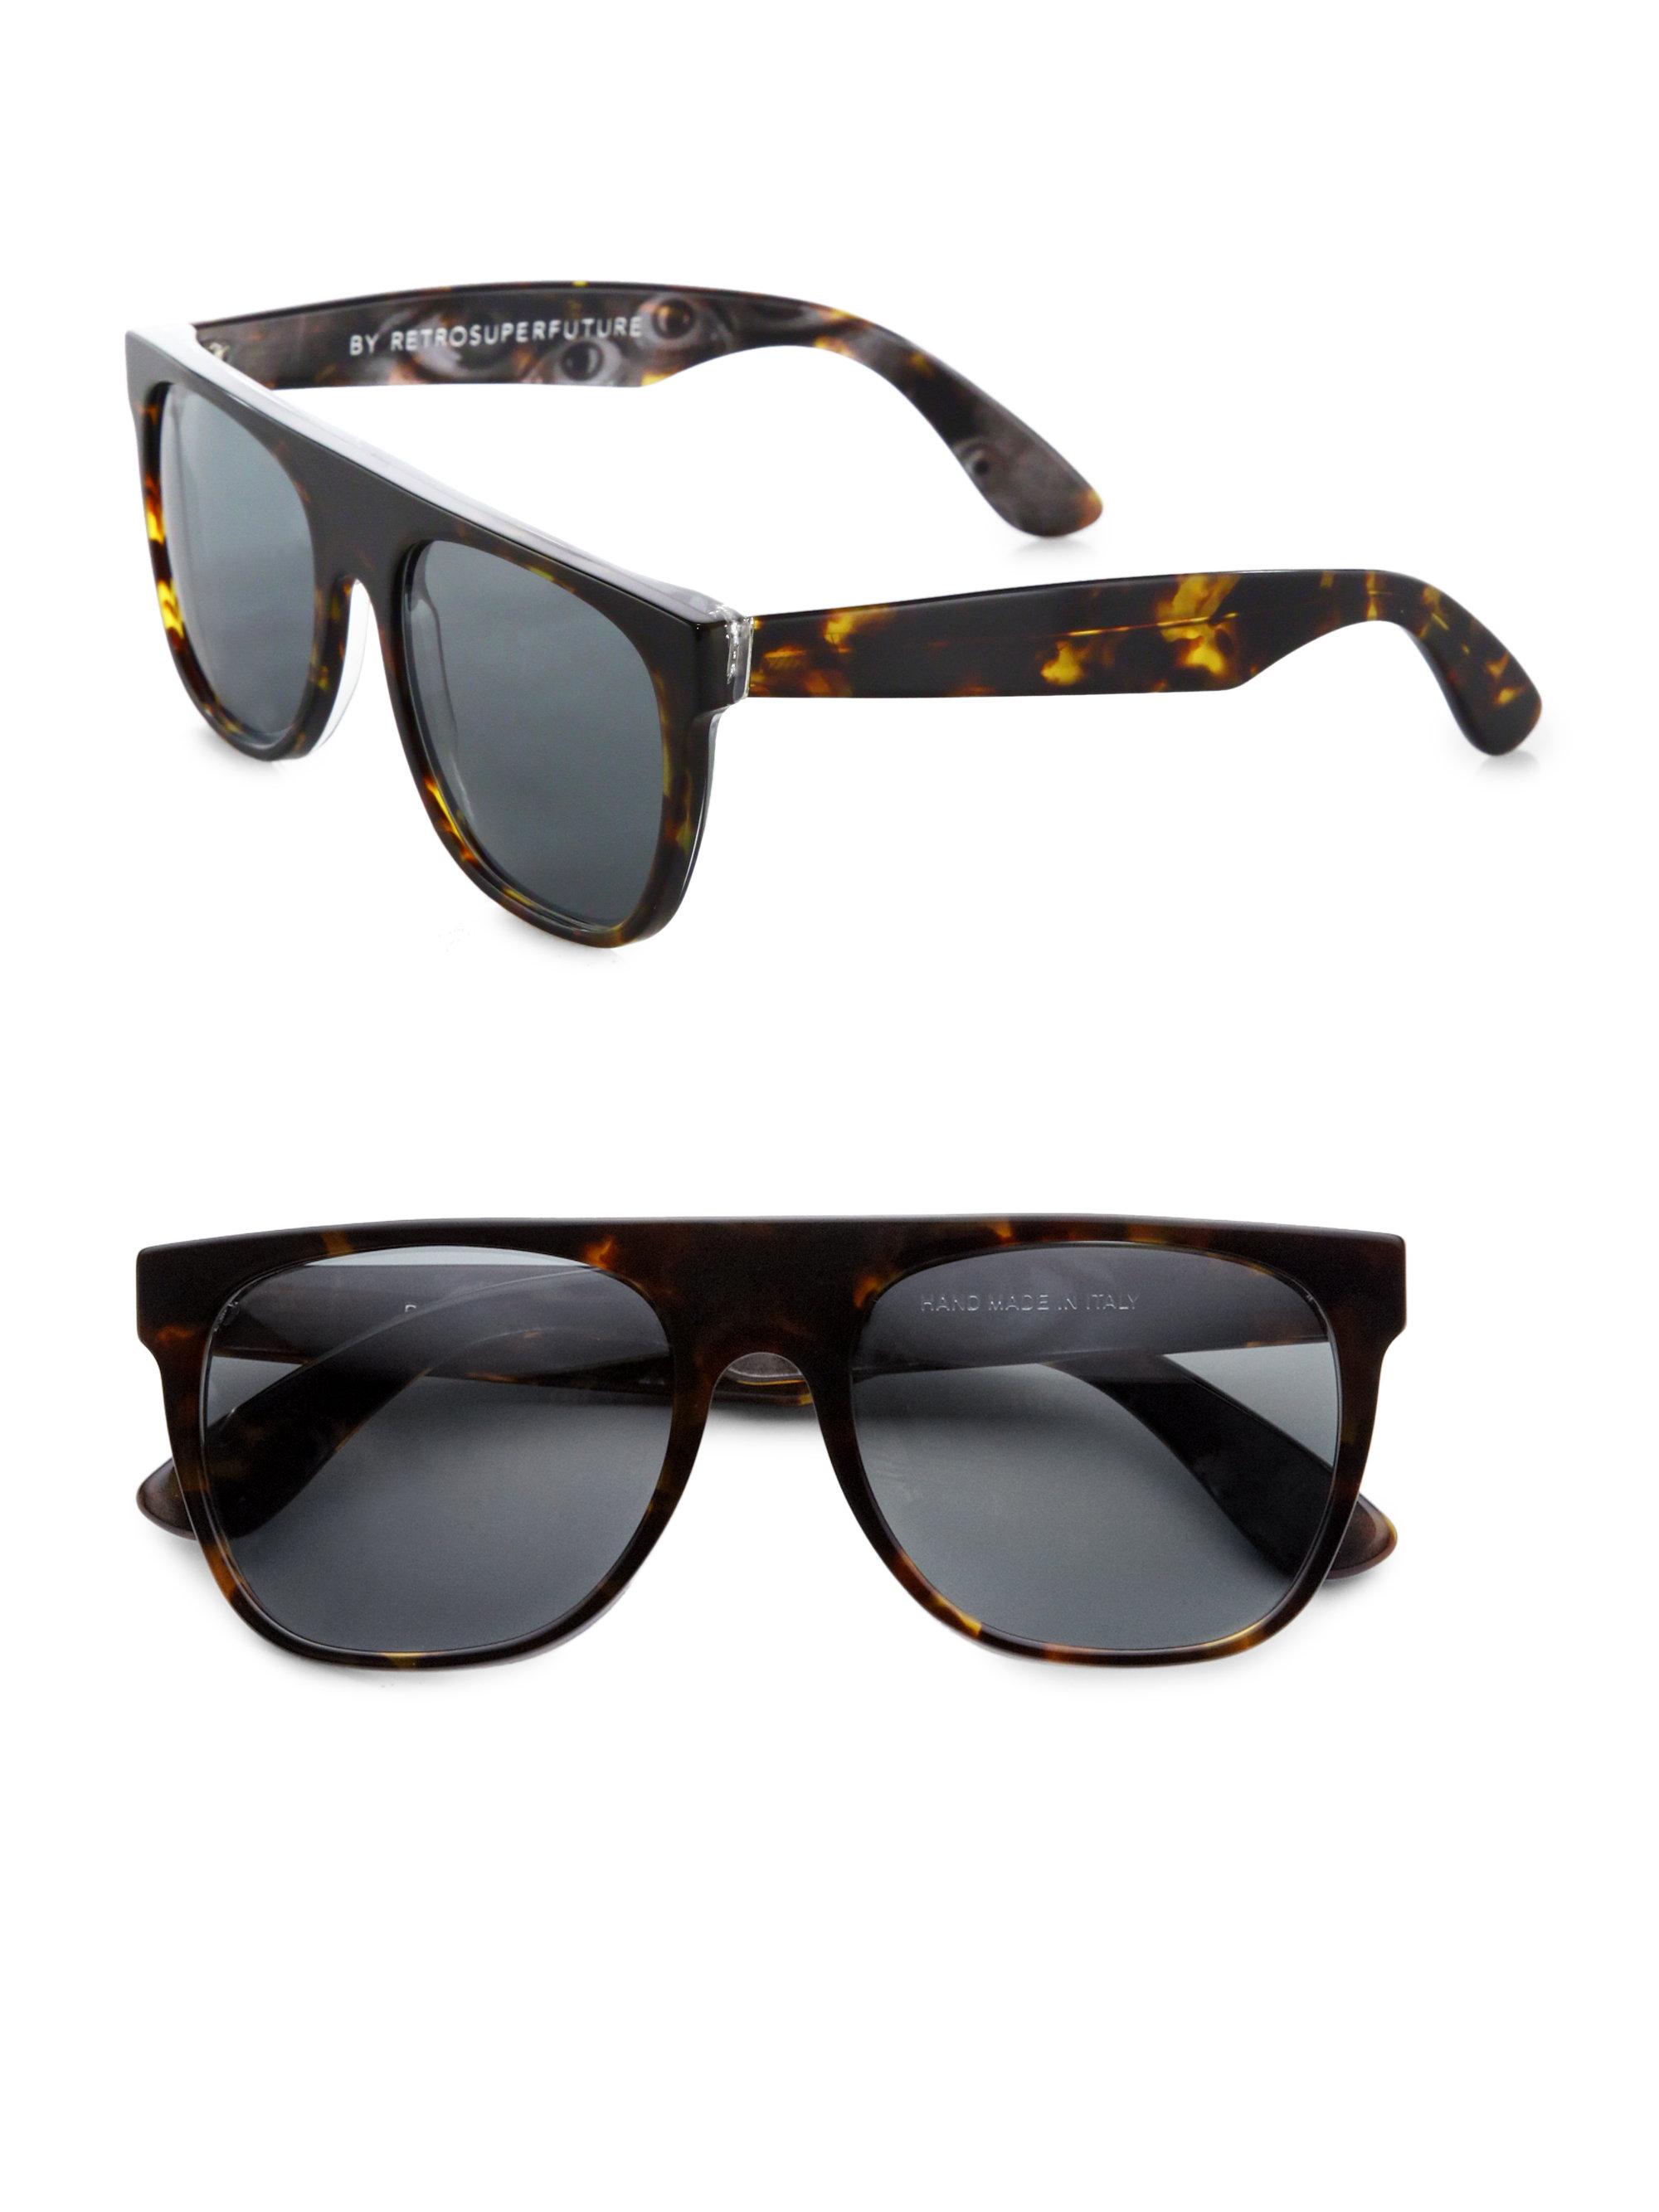 612518f6f6f Retrosuperfuture Flat-top Sunglasses Ebay